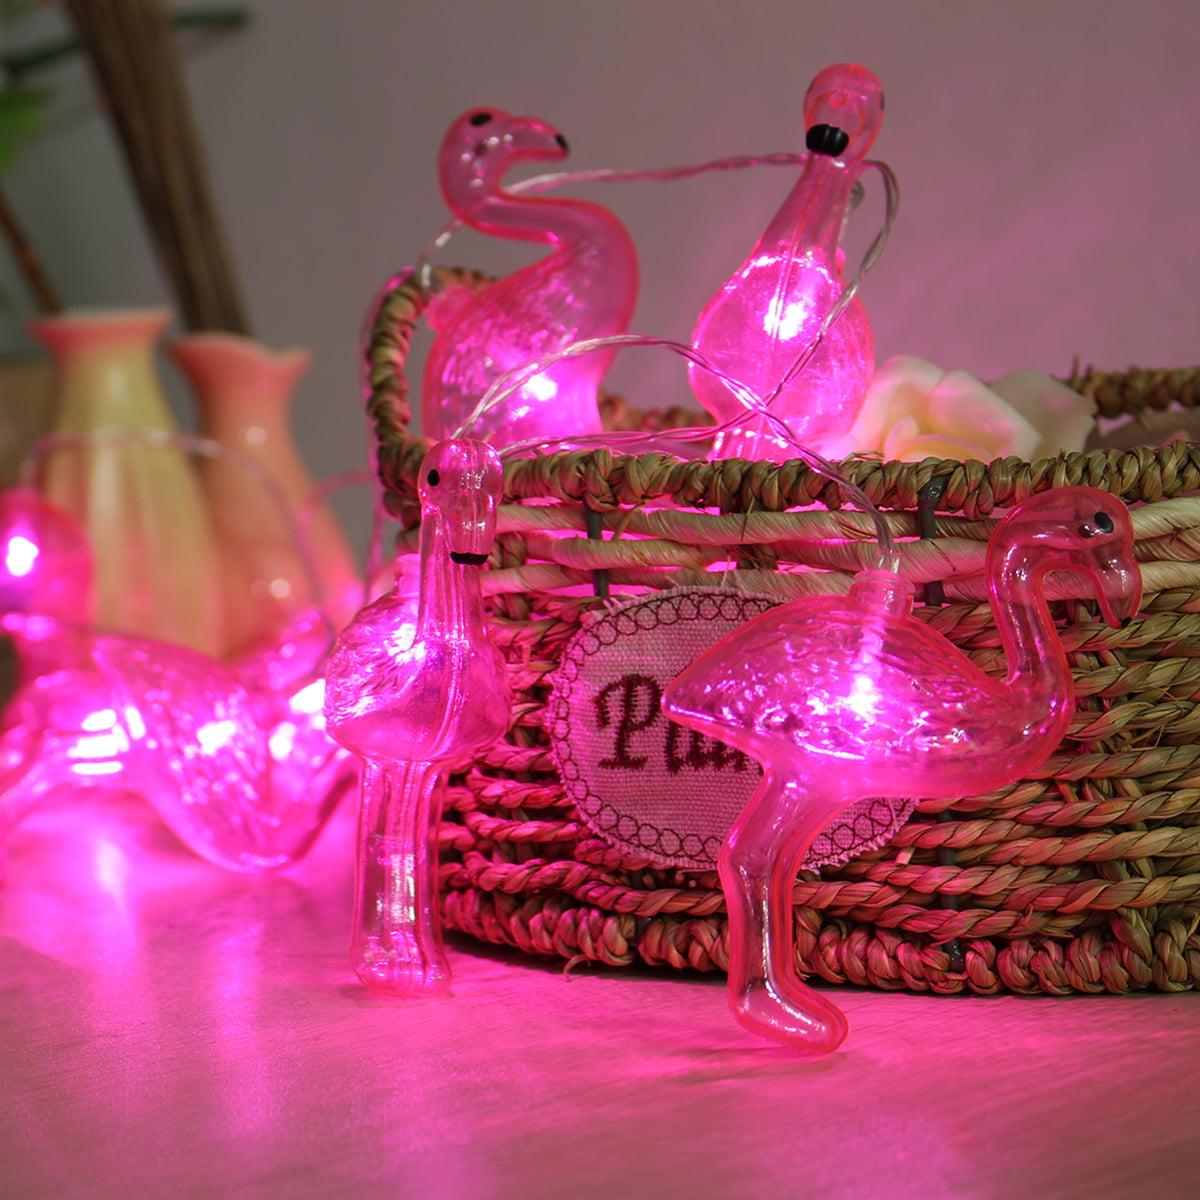 10LED String Light 1.65m Porch Patio Christmas Wedding Party Home Room Decor Gift Flamingo Bulb